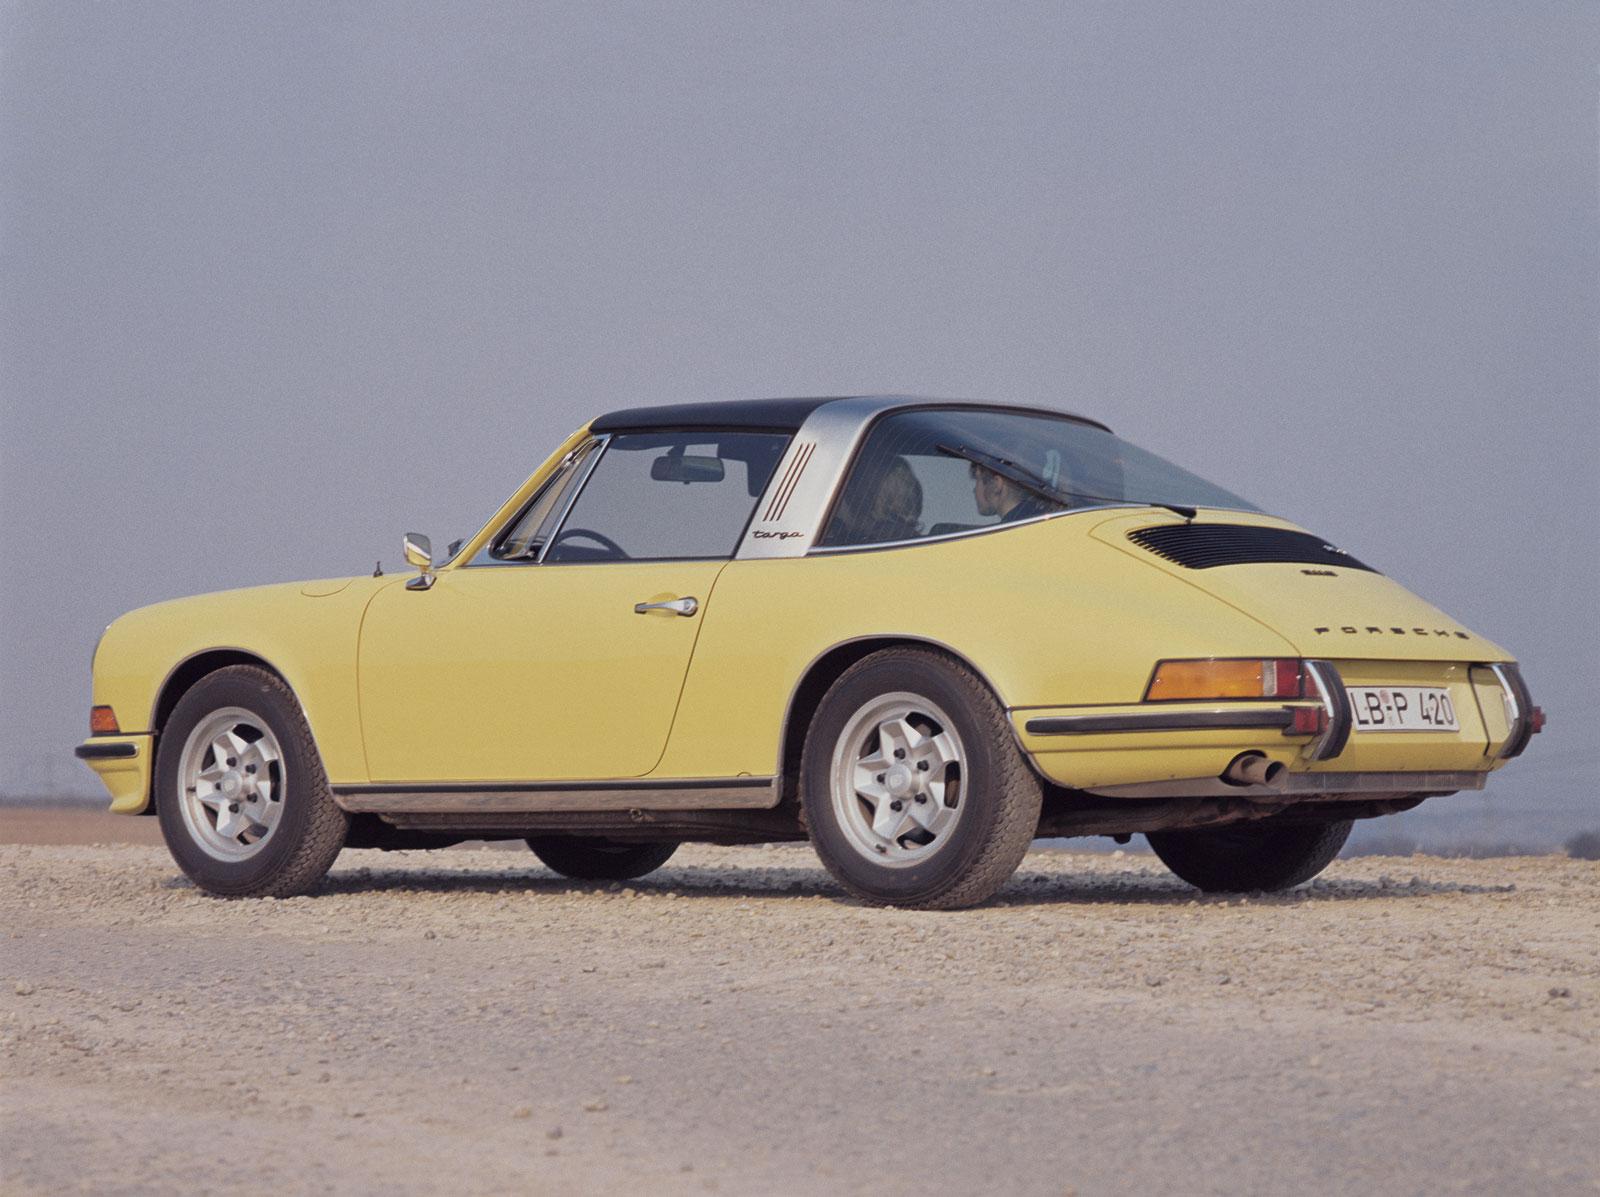 1973 porsche 911 e 2 4 targa car body design. Black Bedroom Furniture Sets. Home Design Ideas